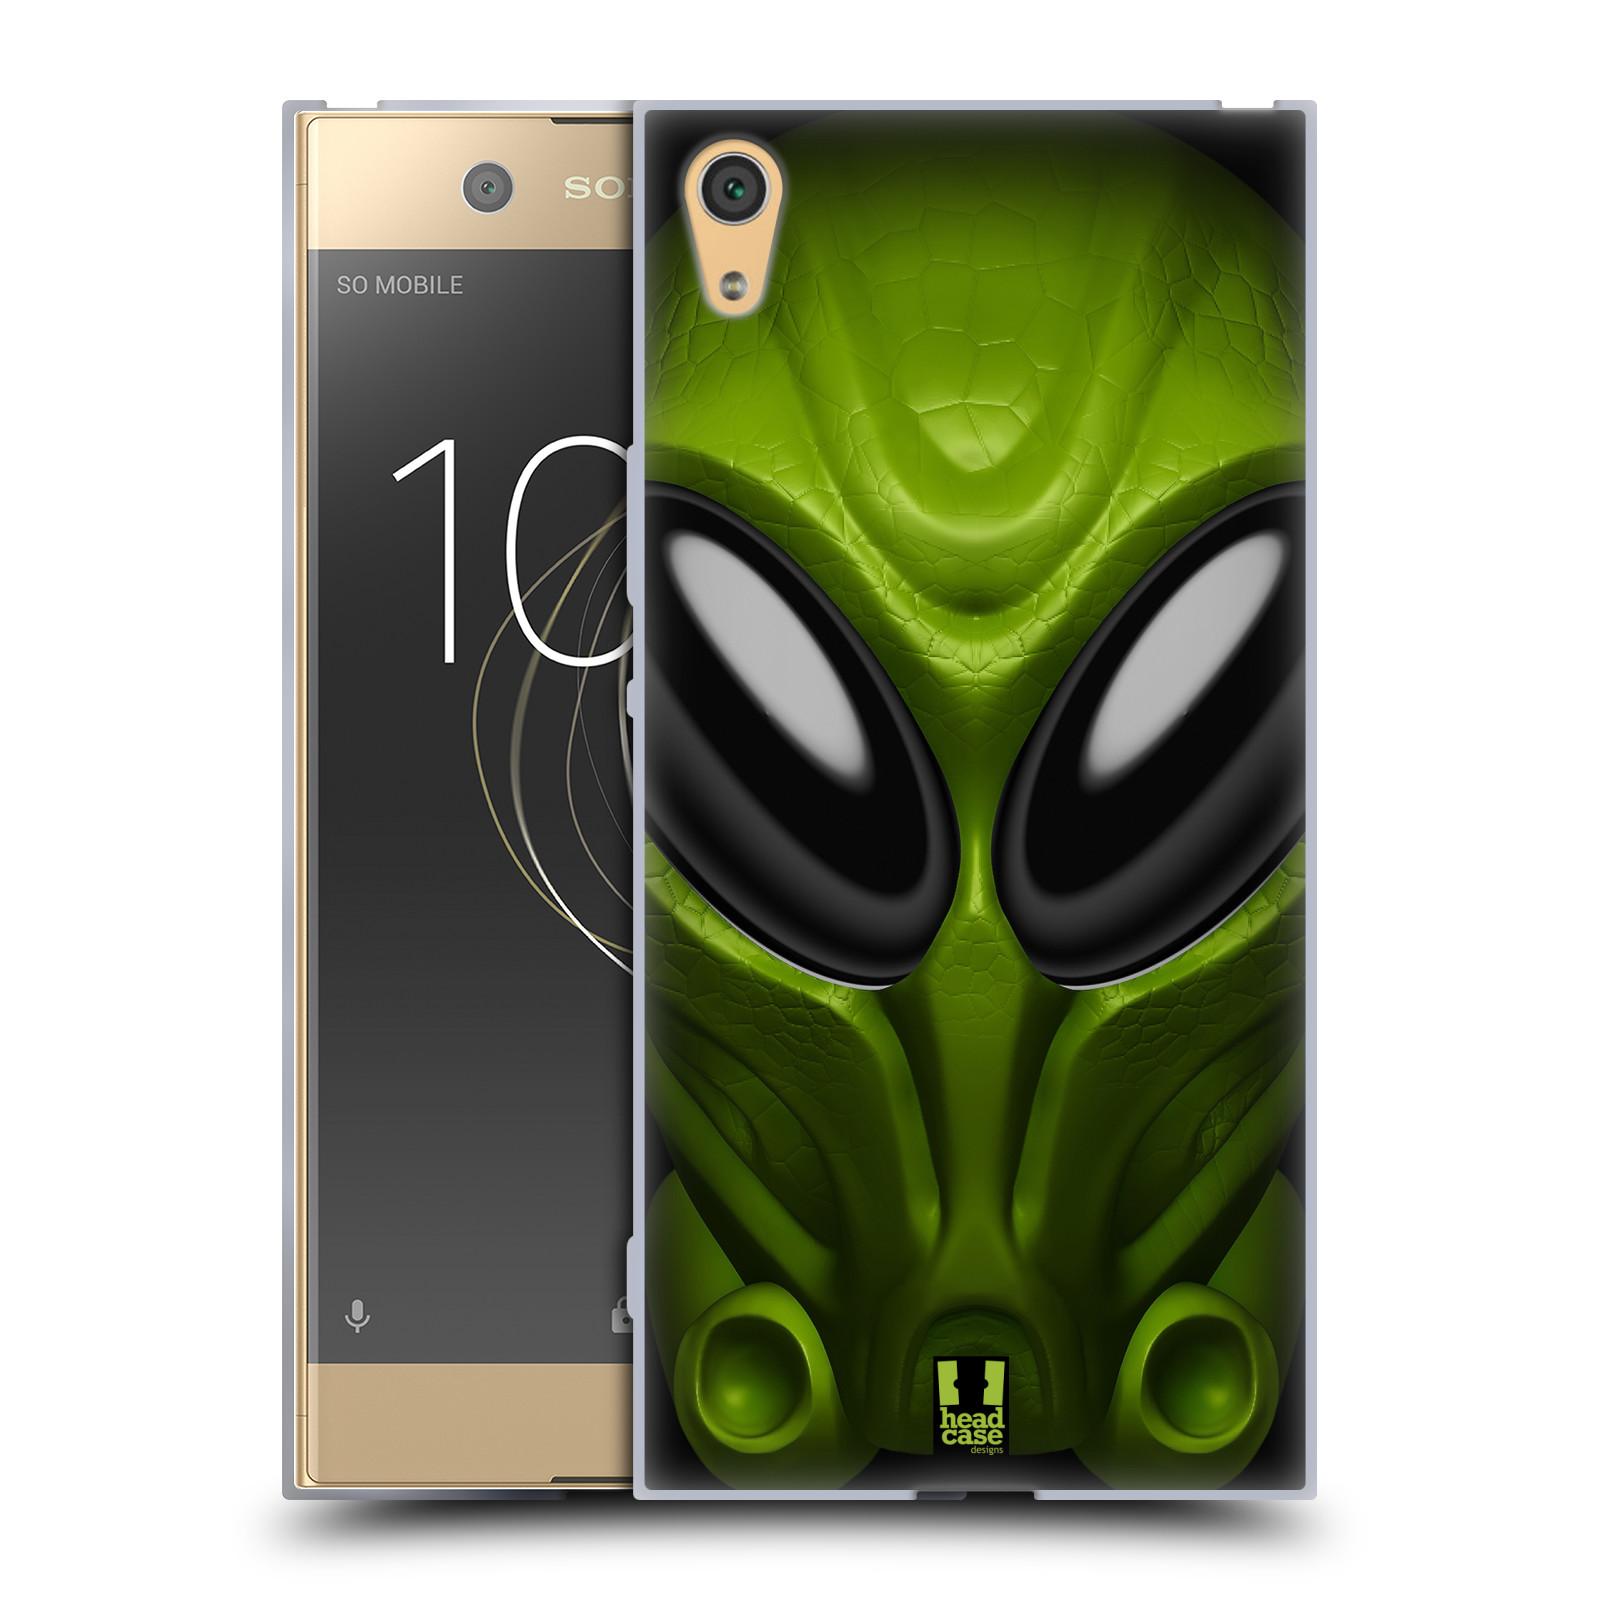 Silikonové pouzdro na mobil Sony Xperia XA1 Ultra - Head Case - Ufoun Mastermind